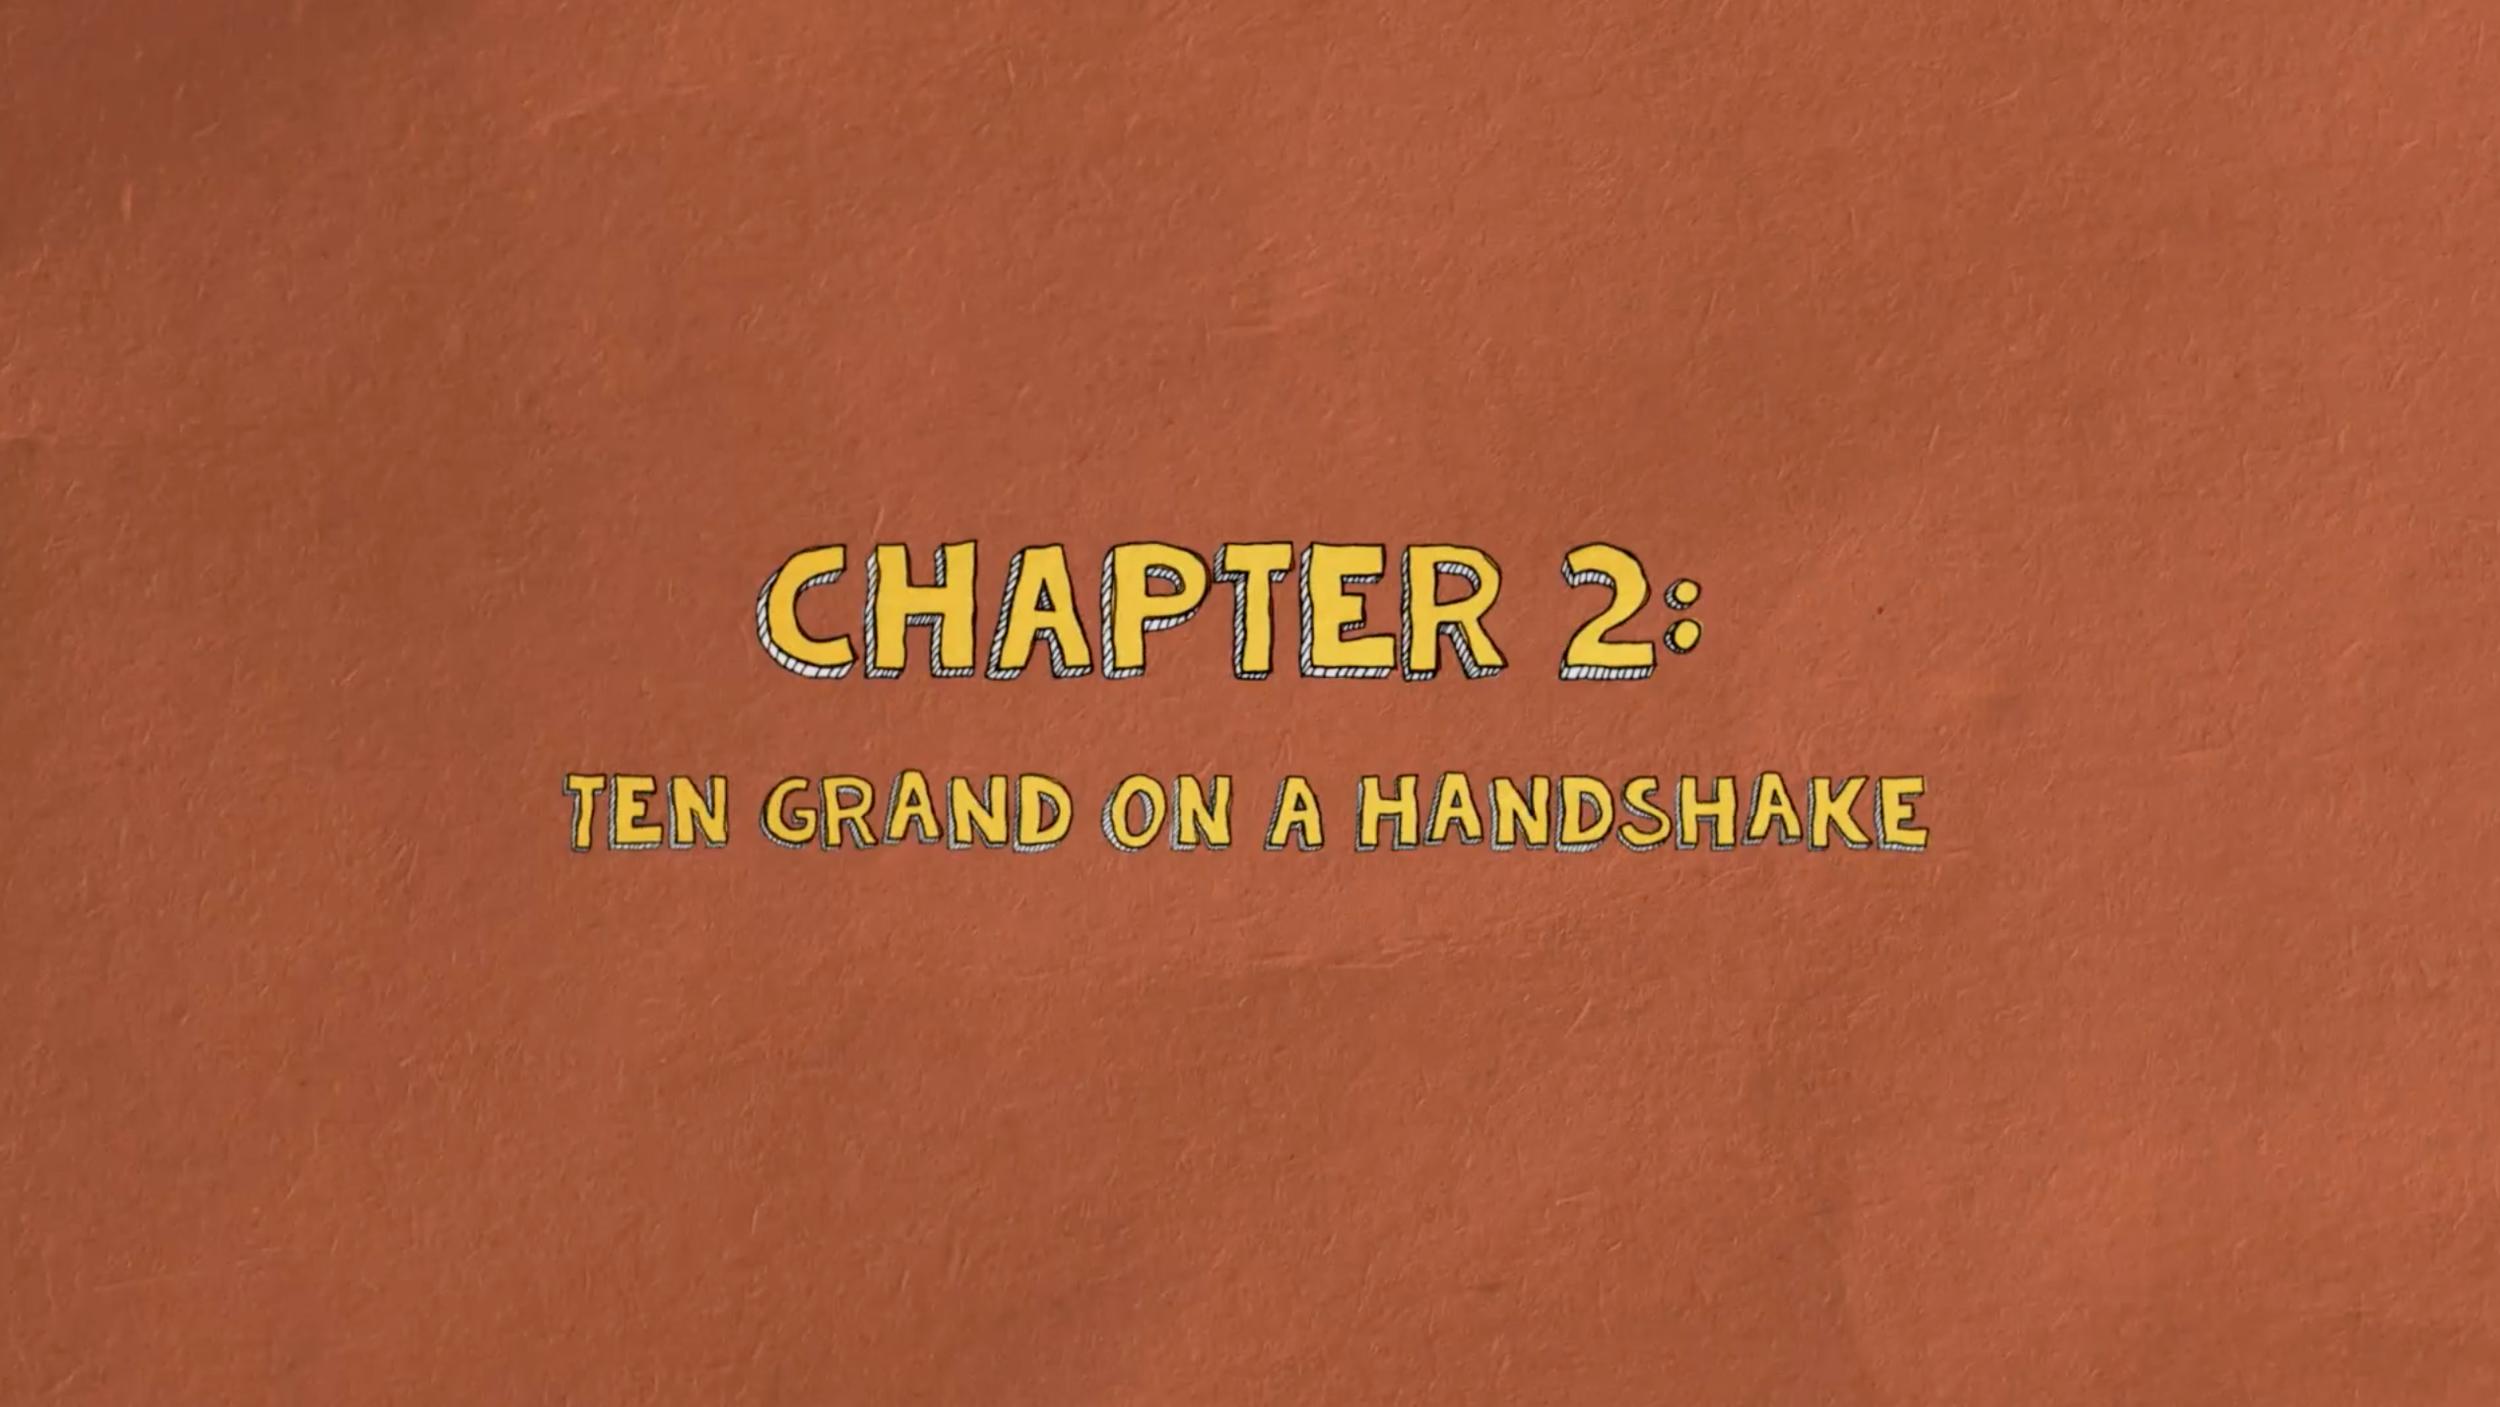 Chapter 2 screengrab.png